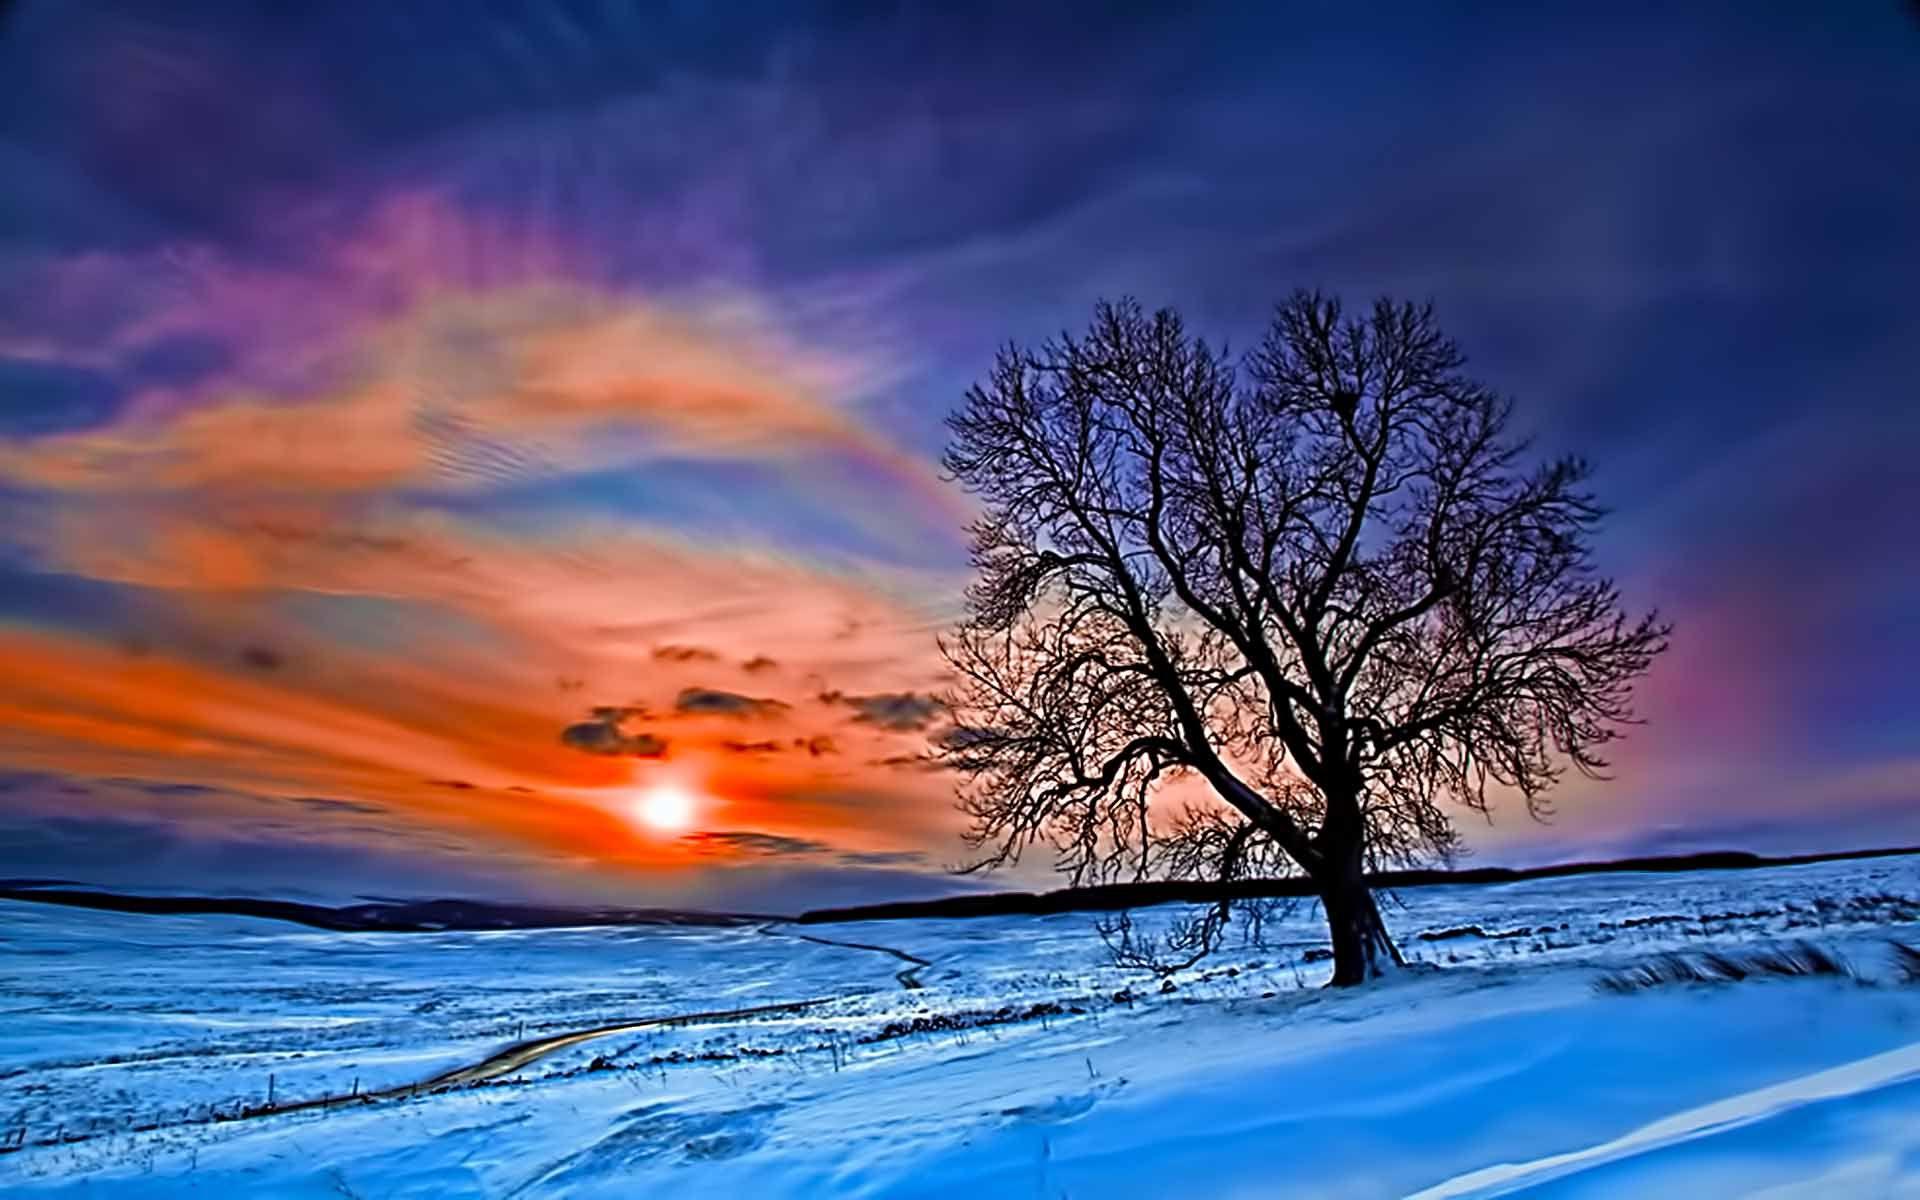 Winter Beautiful Sunrise (id 83894)